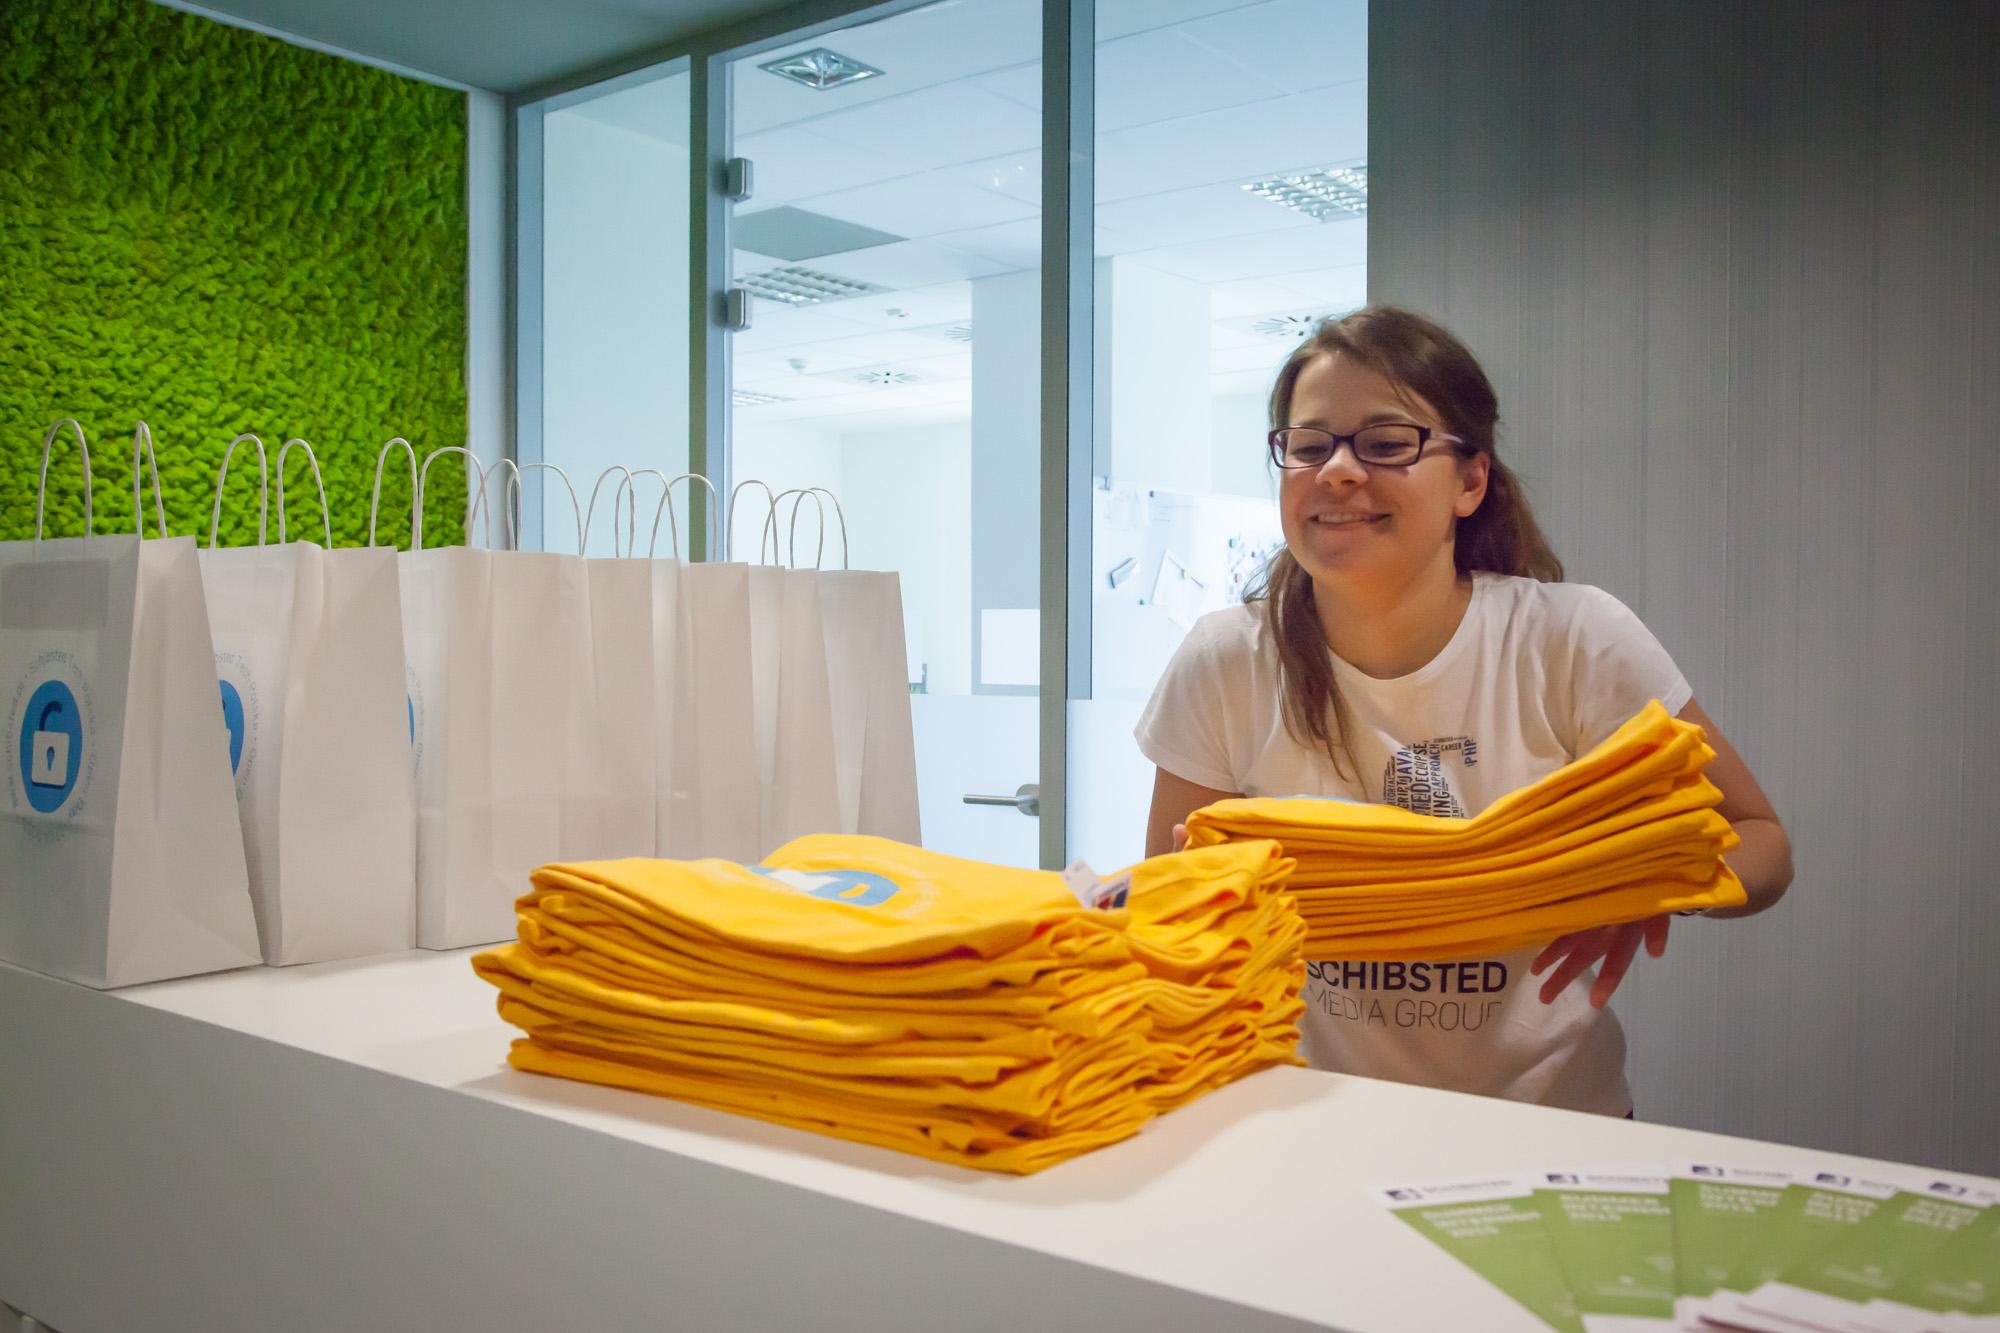 Recruiter Aleksandra Niemyska is getting T-shirts ready for the students